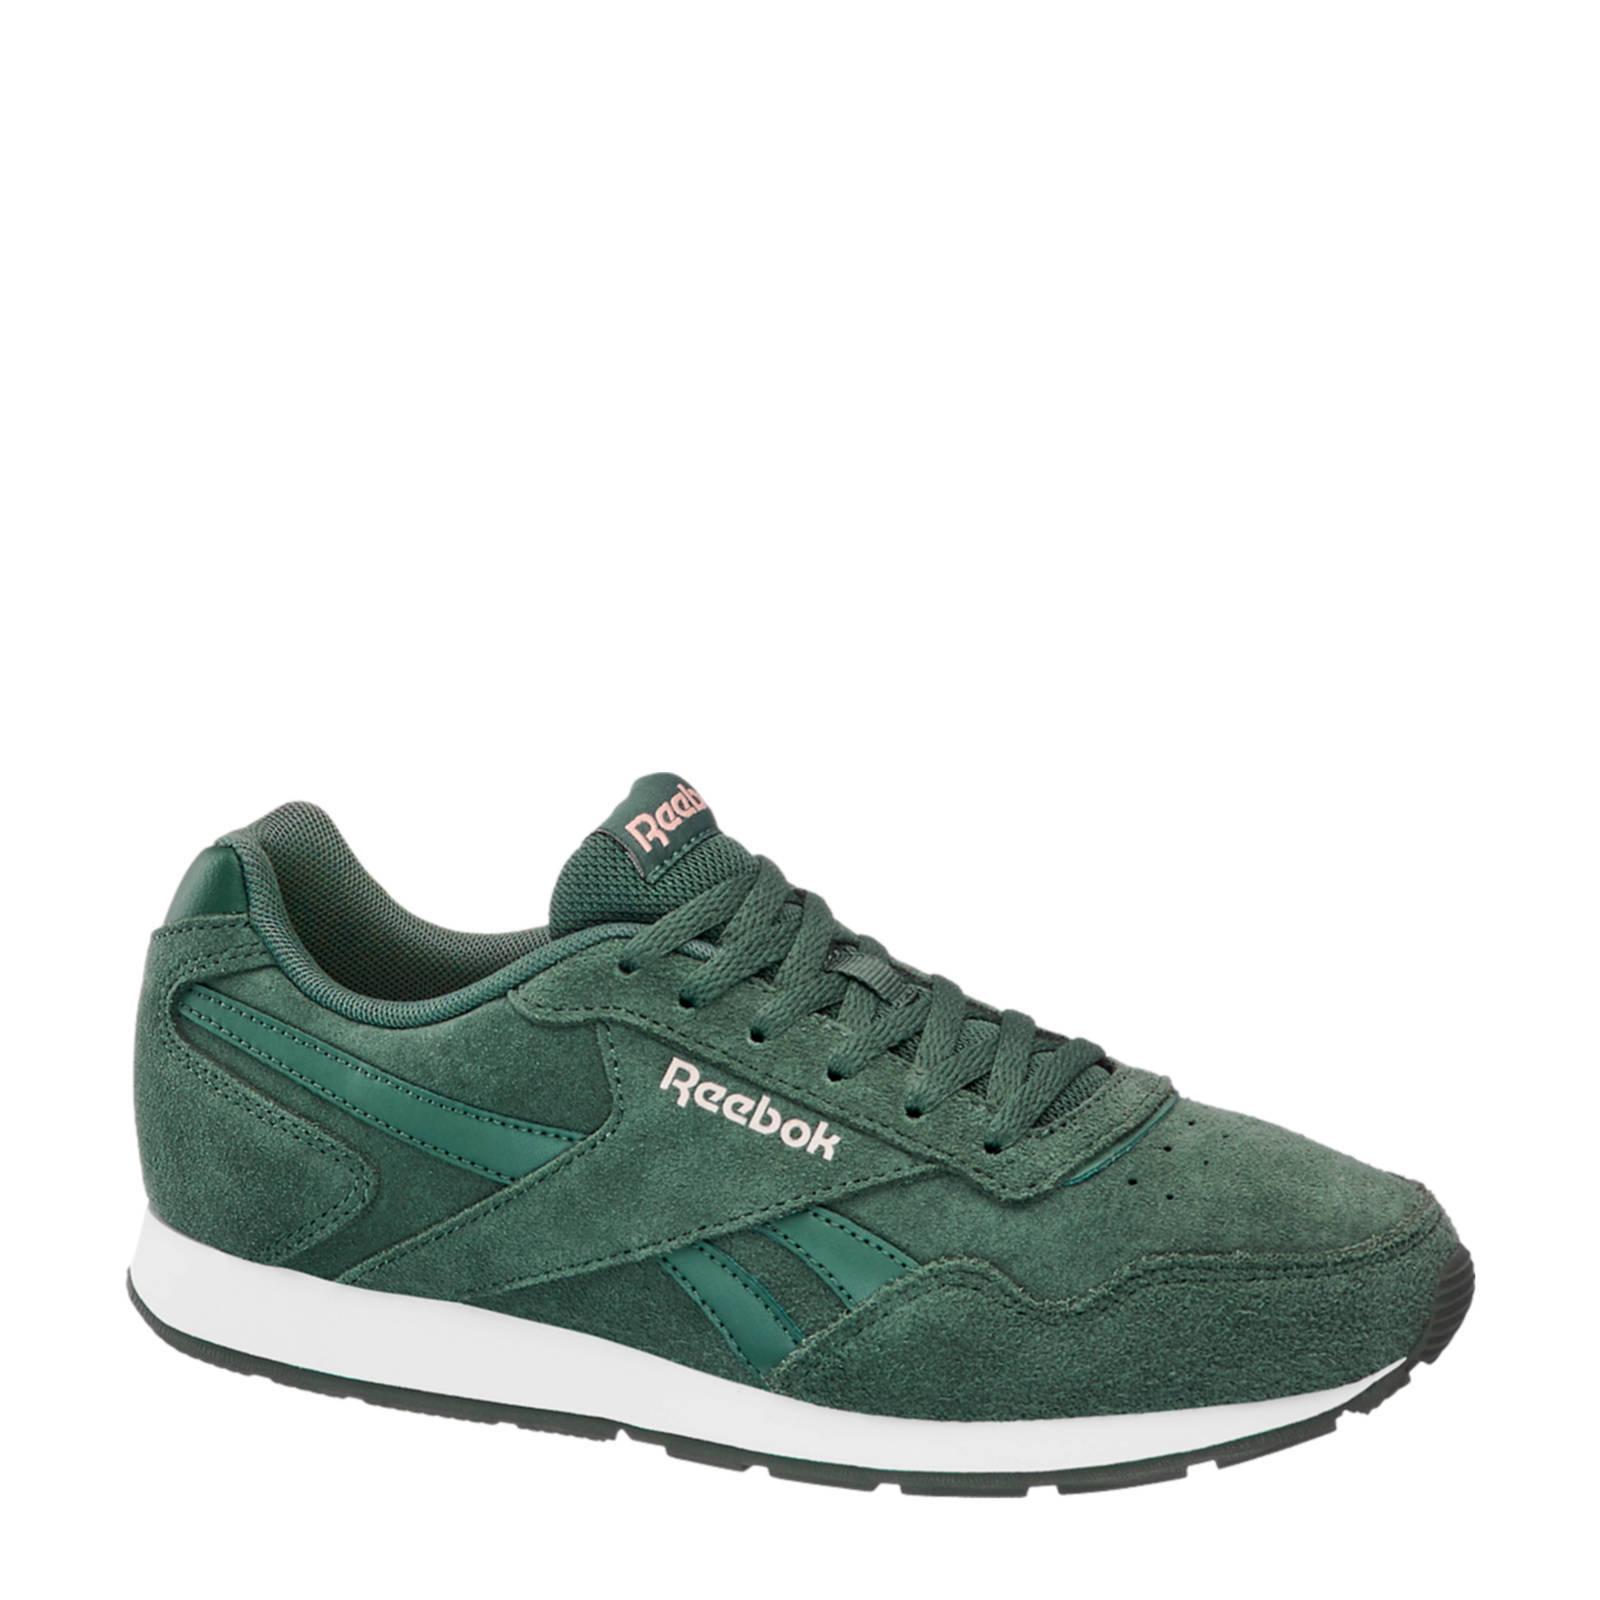 Glide GroenWehkamp Sneakers Royal Syède Reebok 5R4jL3A